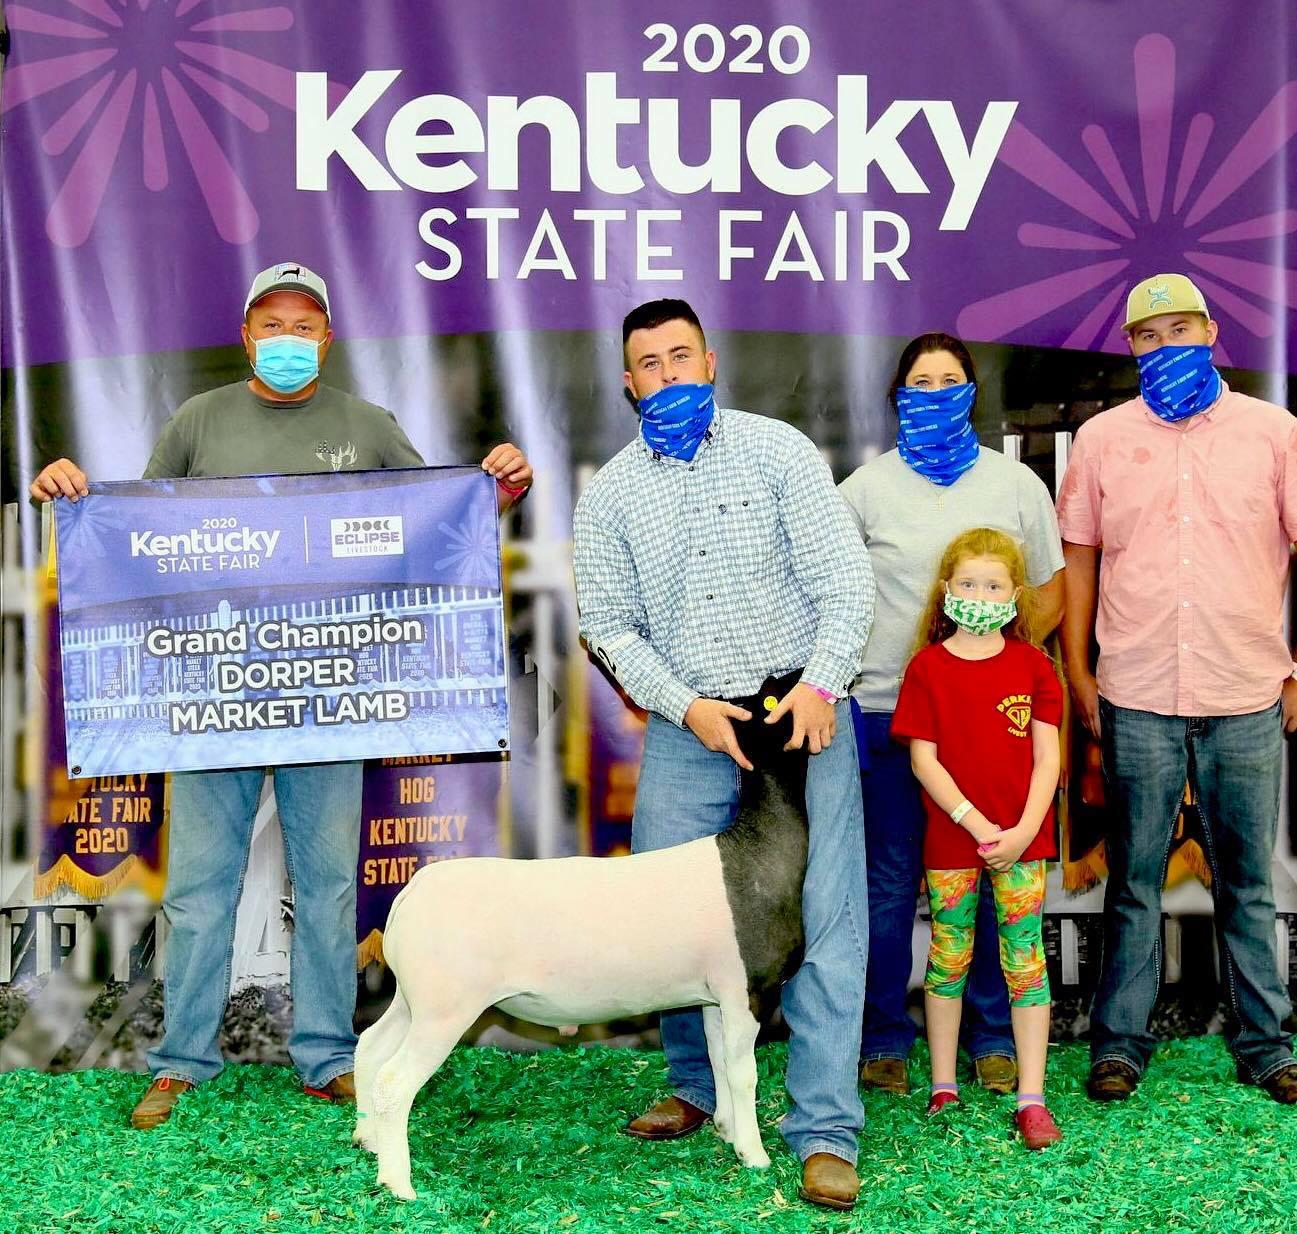 Champion Dorper 2020 Kentucky State Fair Congratulations Perkins Family!